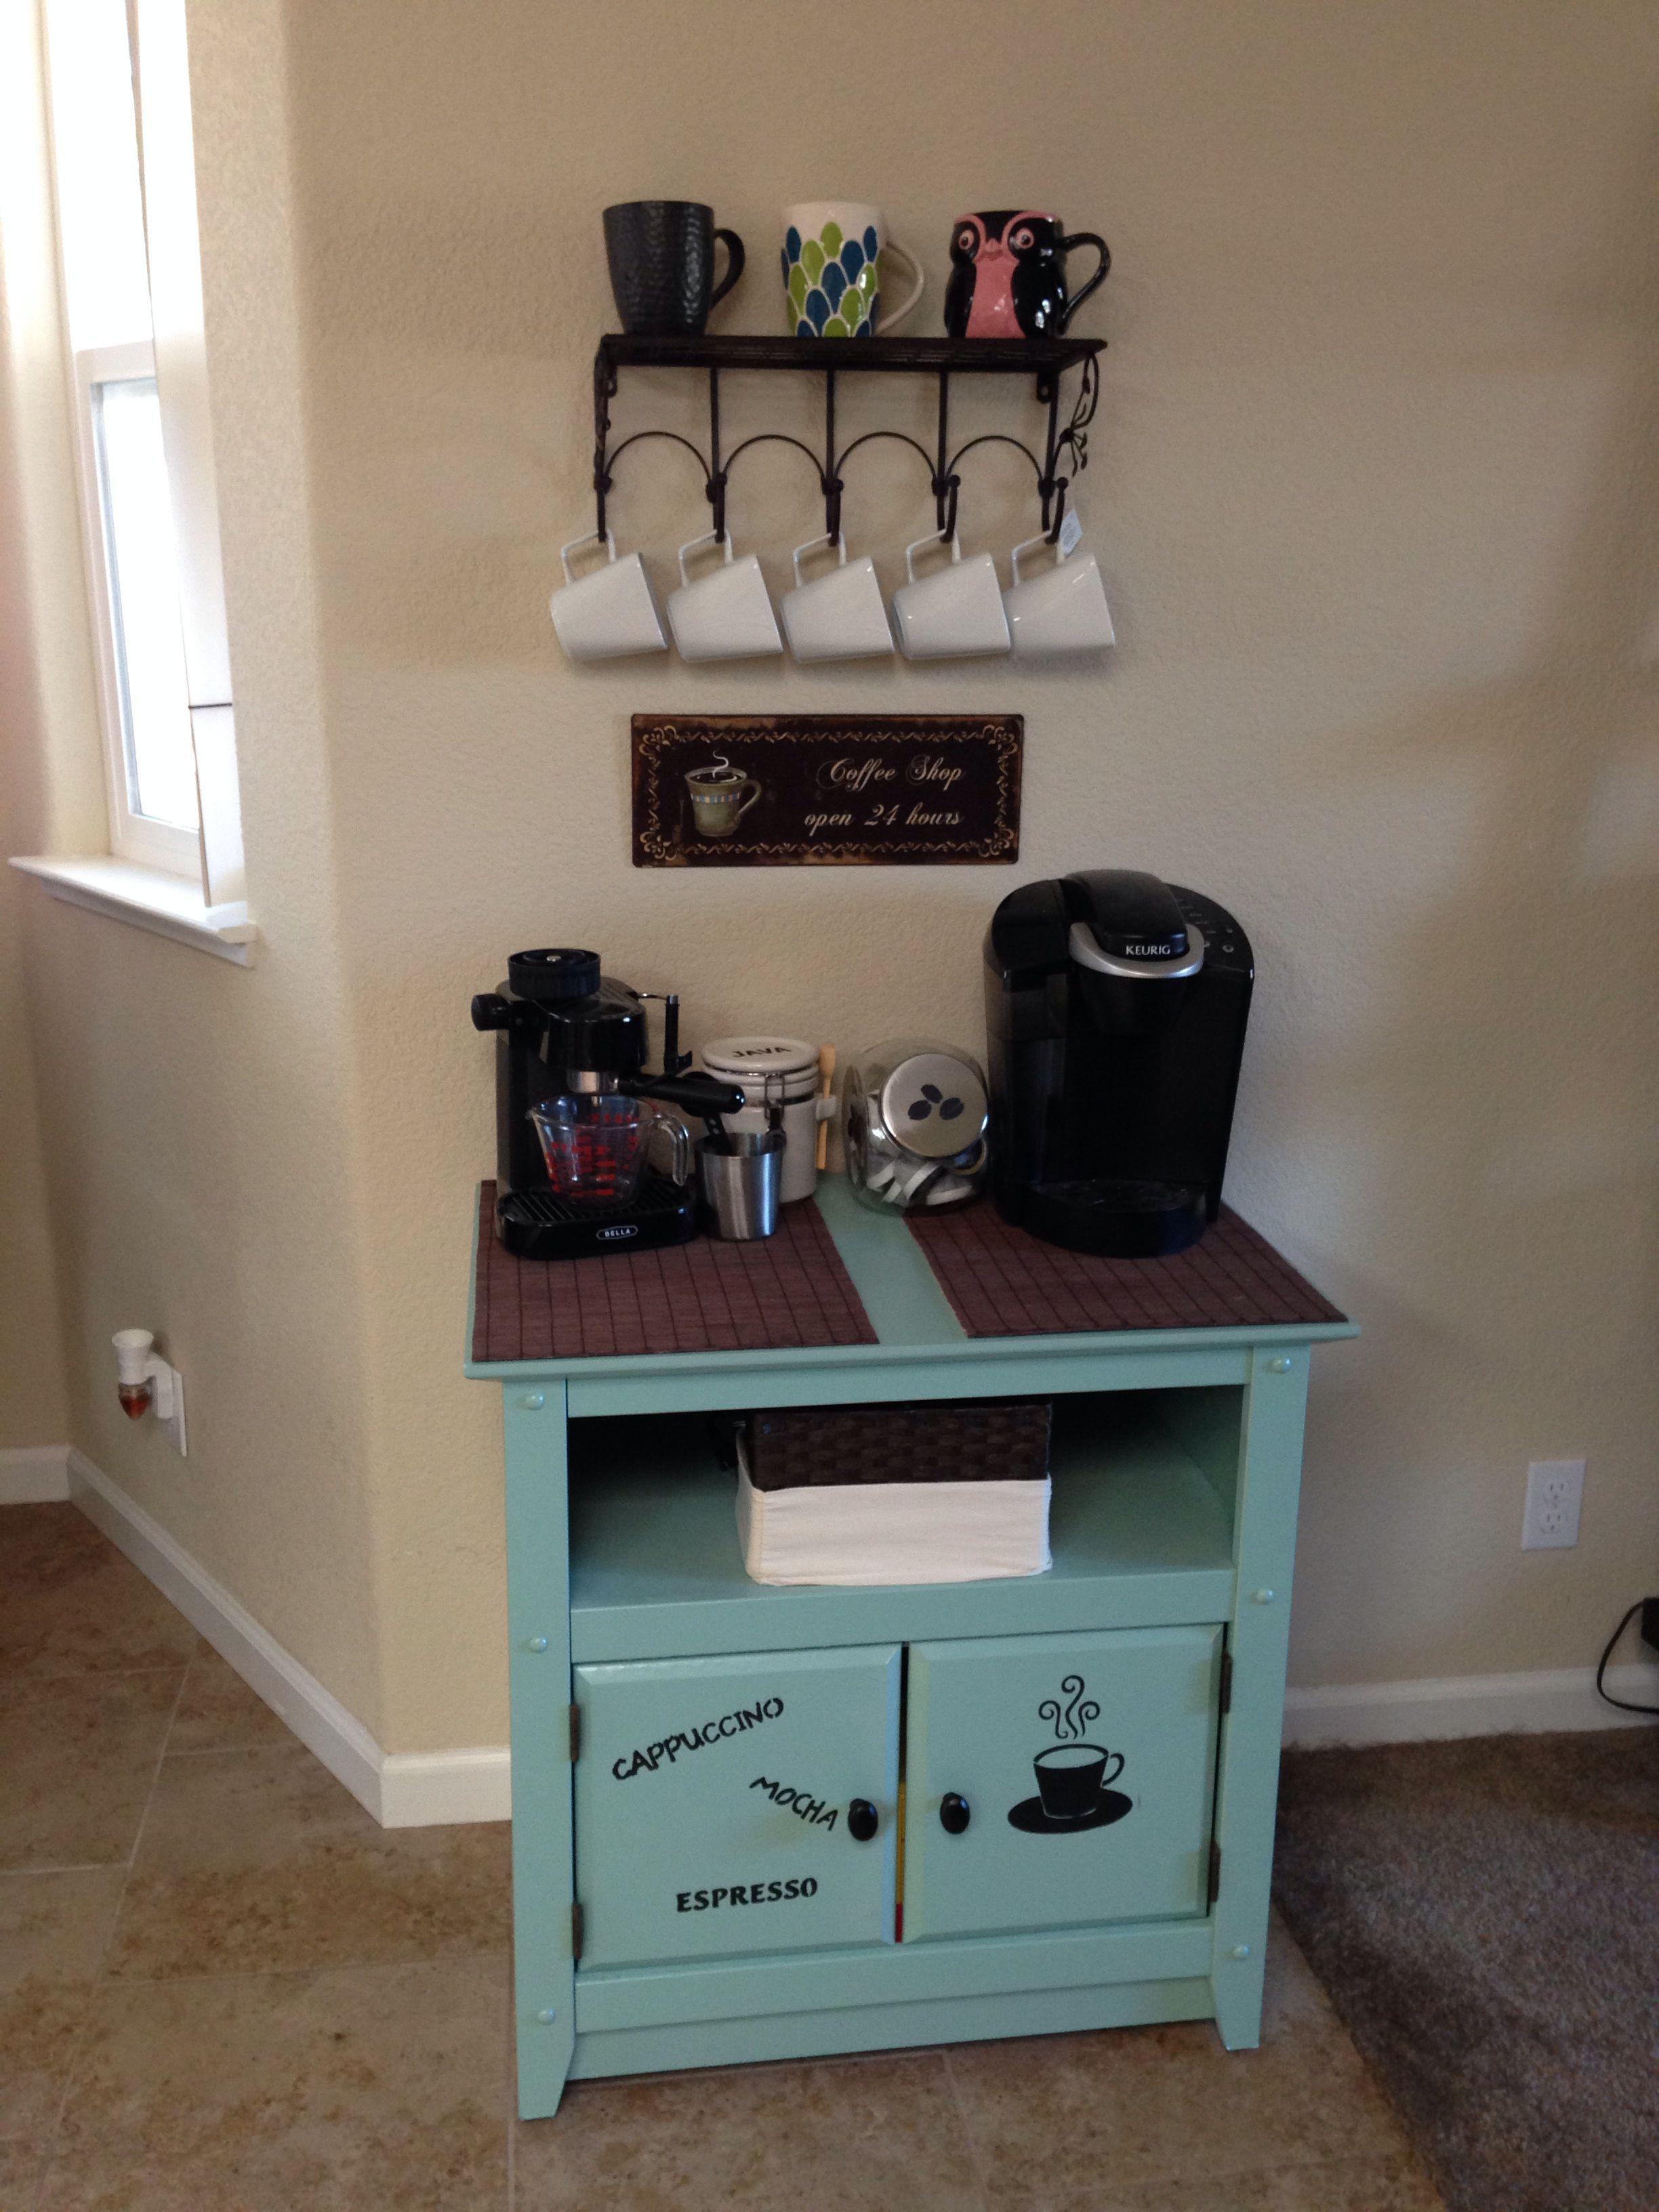 6 jawdropping useful tips coffee tree god coffee beans